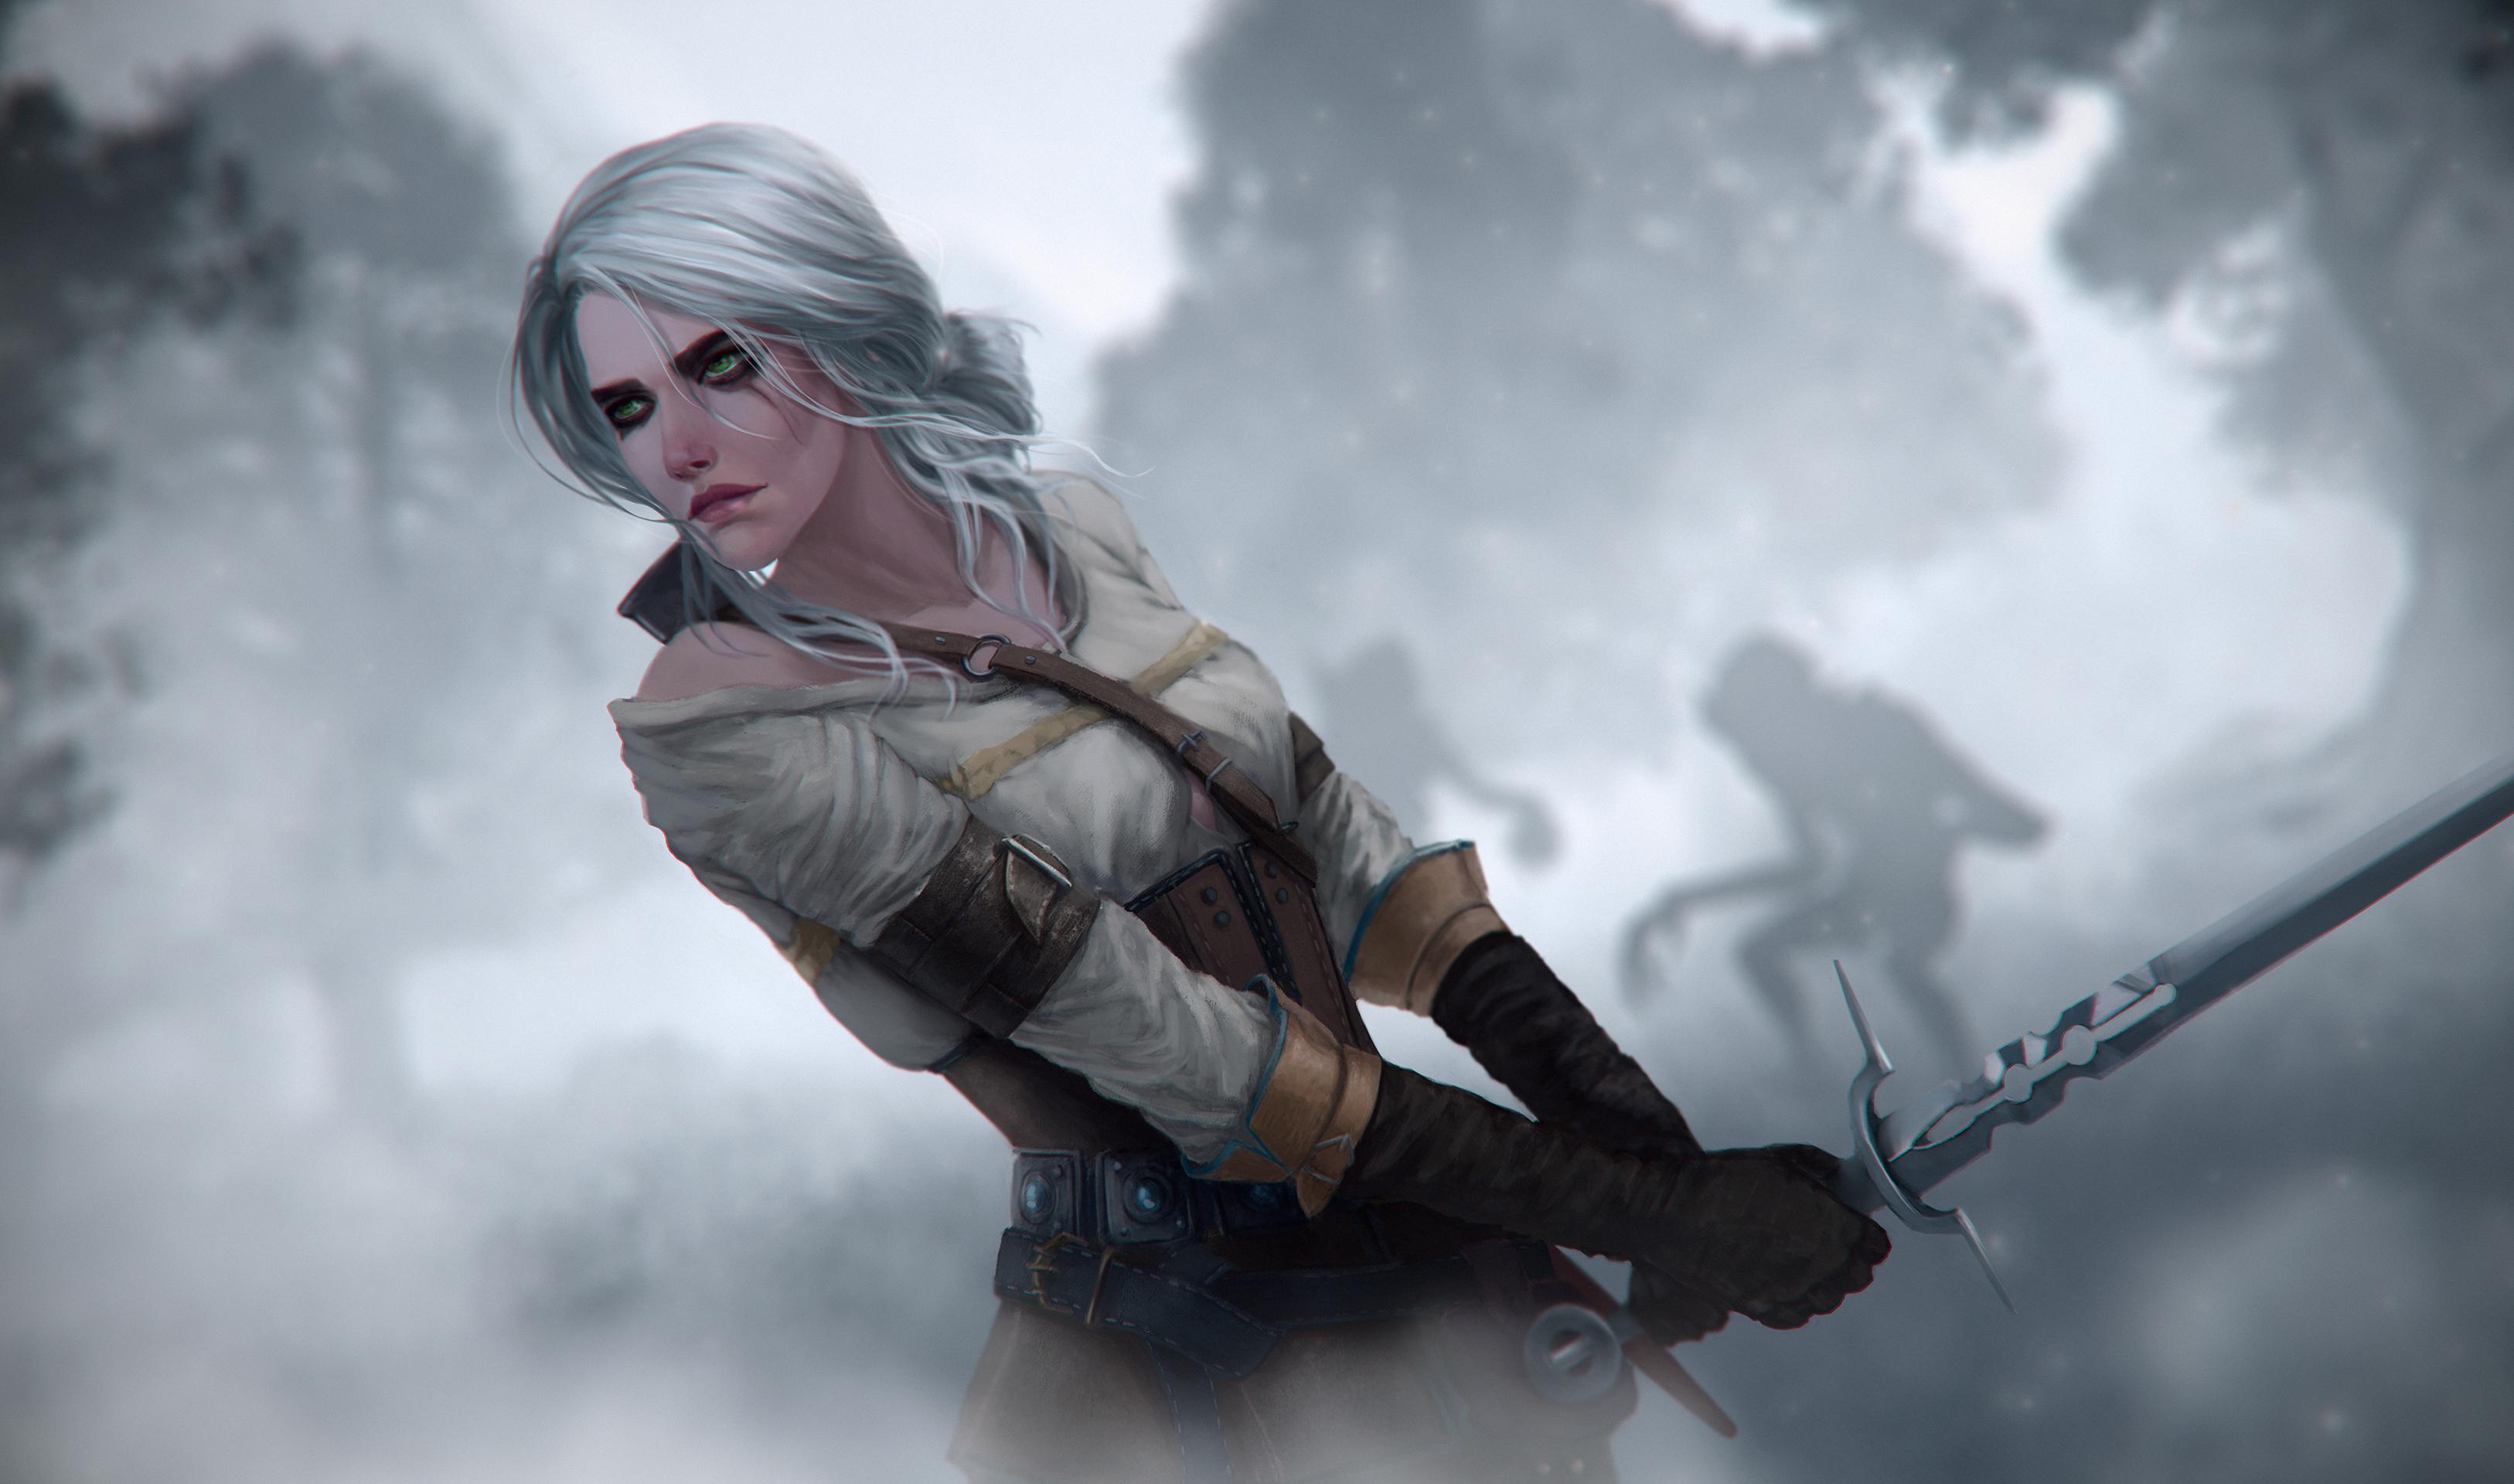 Ciri The Witcher 3 Digital Art 4k, HD Games, 4k Wallpapers ...